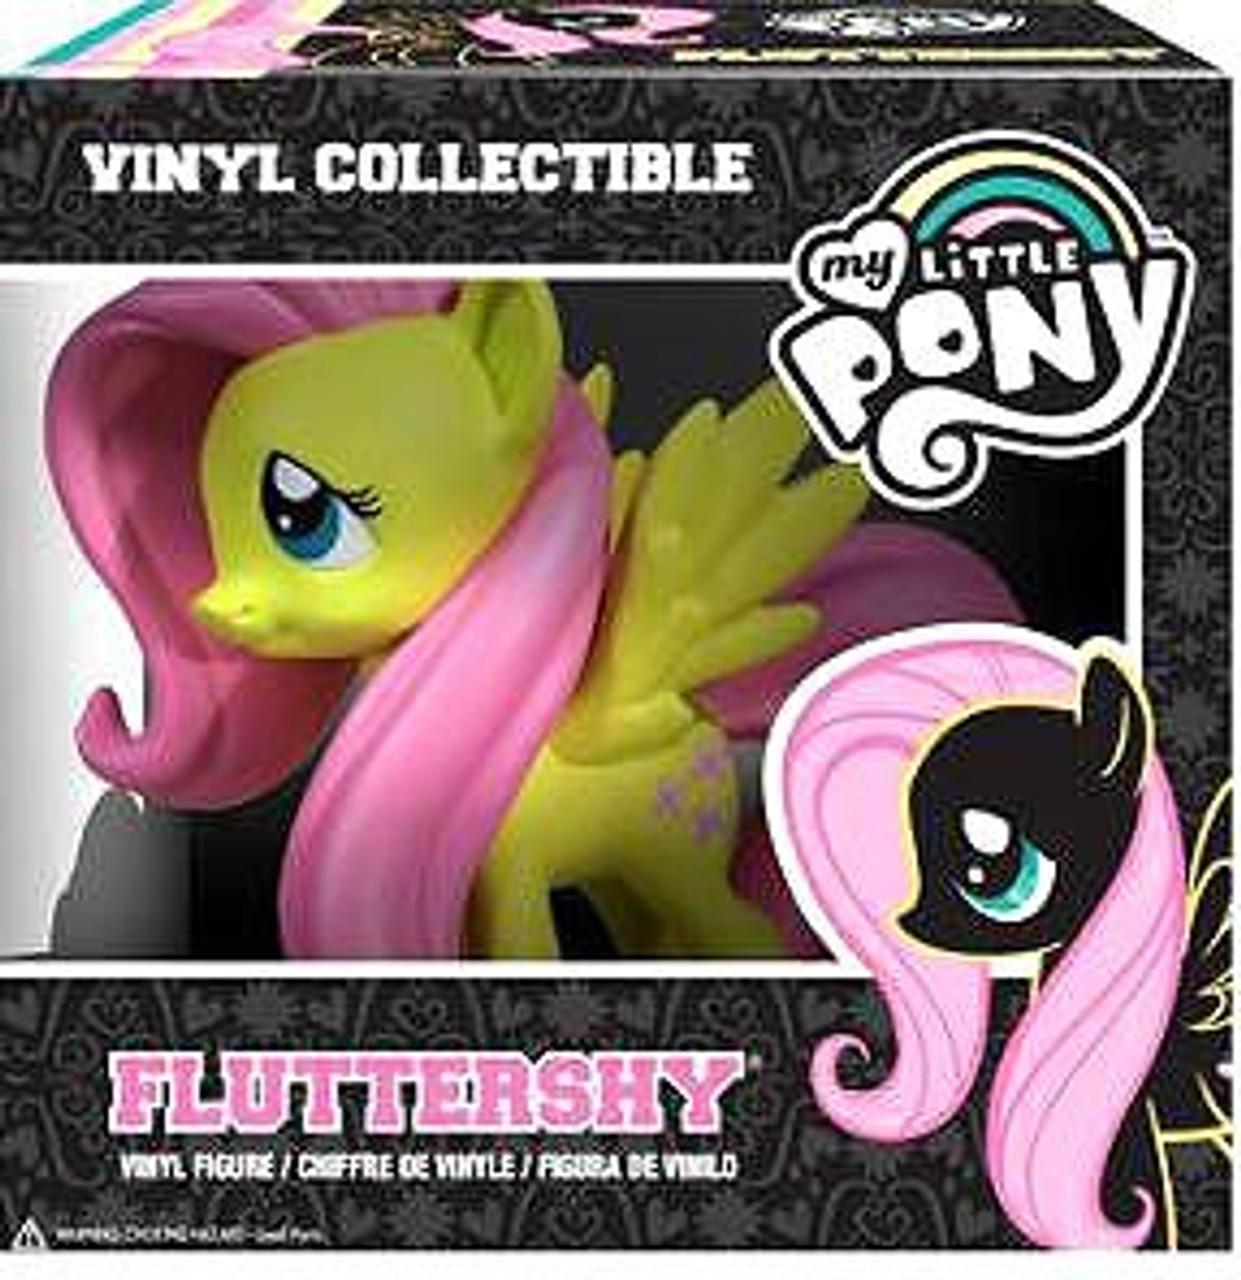 Funko My Little Pony Vinyl Collectibles Fluttershy Vinyl Figure